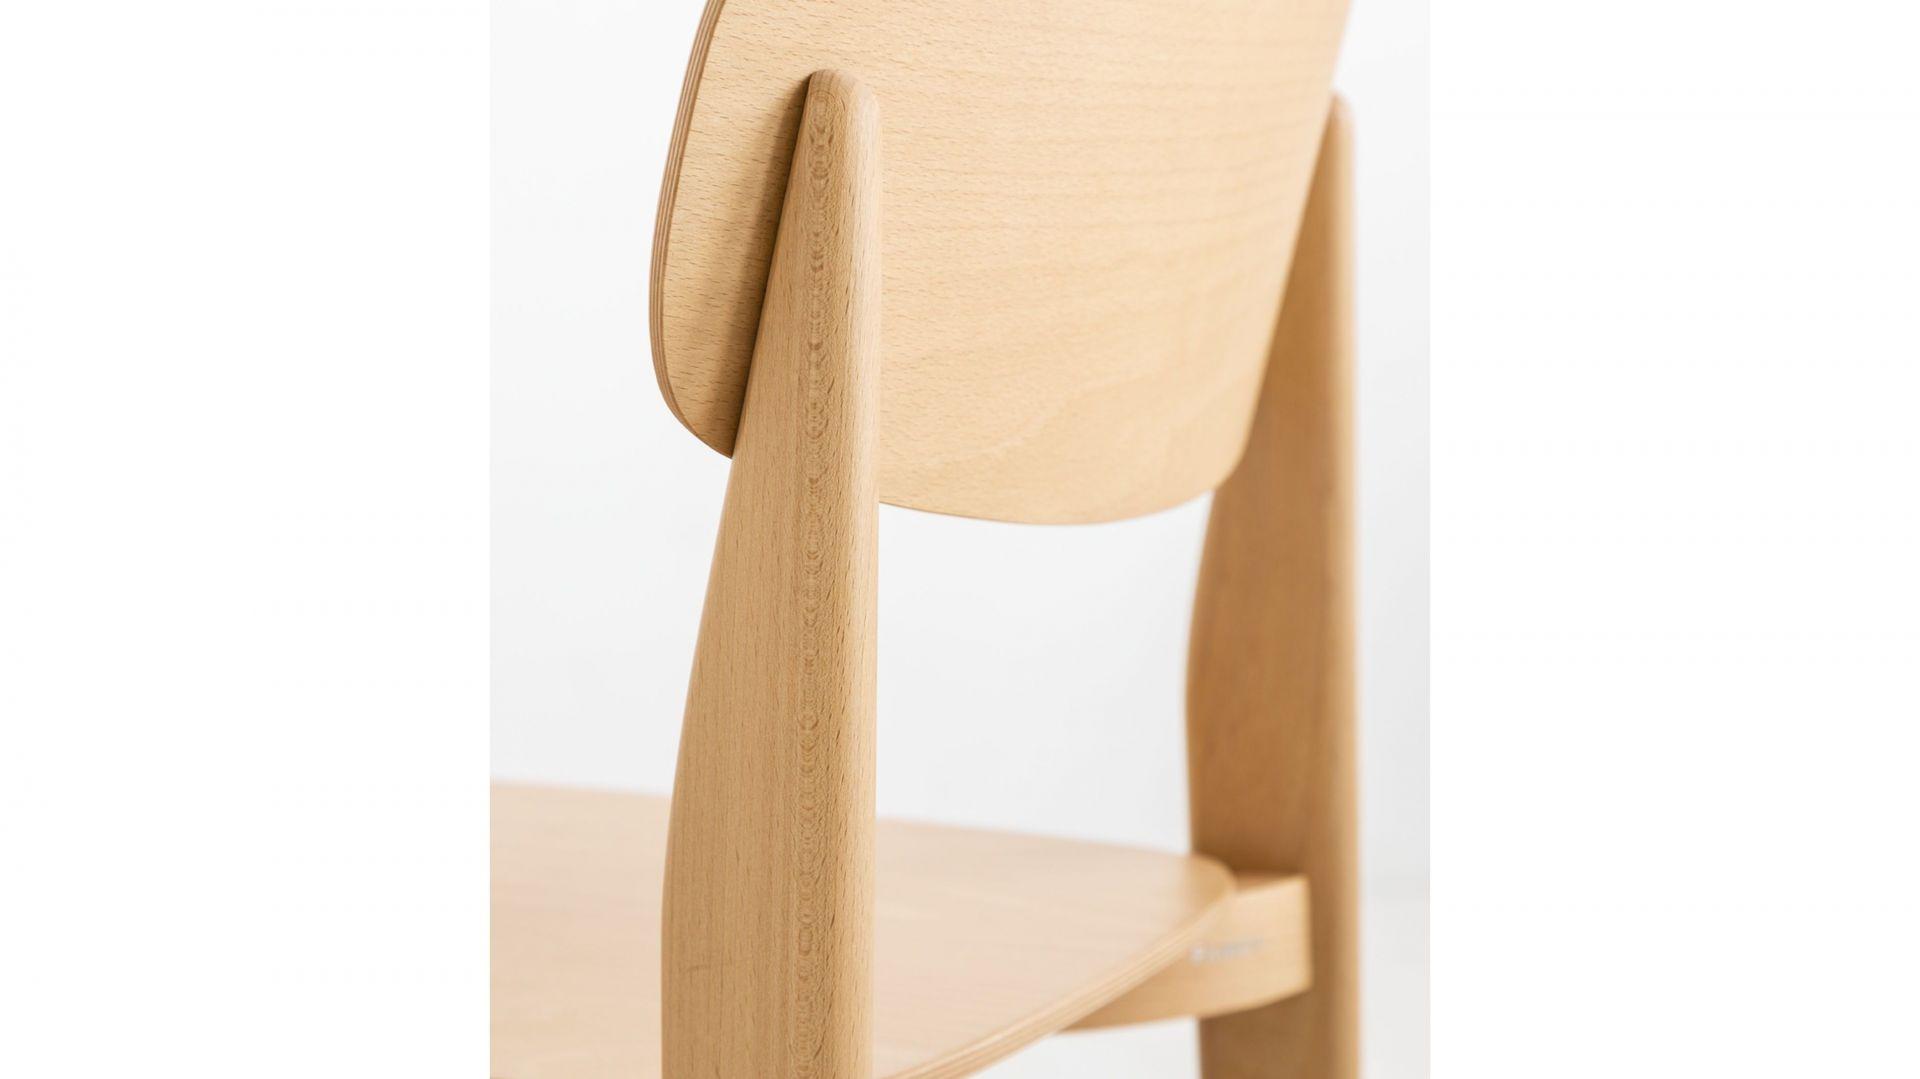 Projekt krzesła dla marki Fameg. Fot. Muka Design Lab